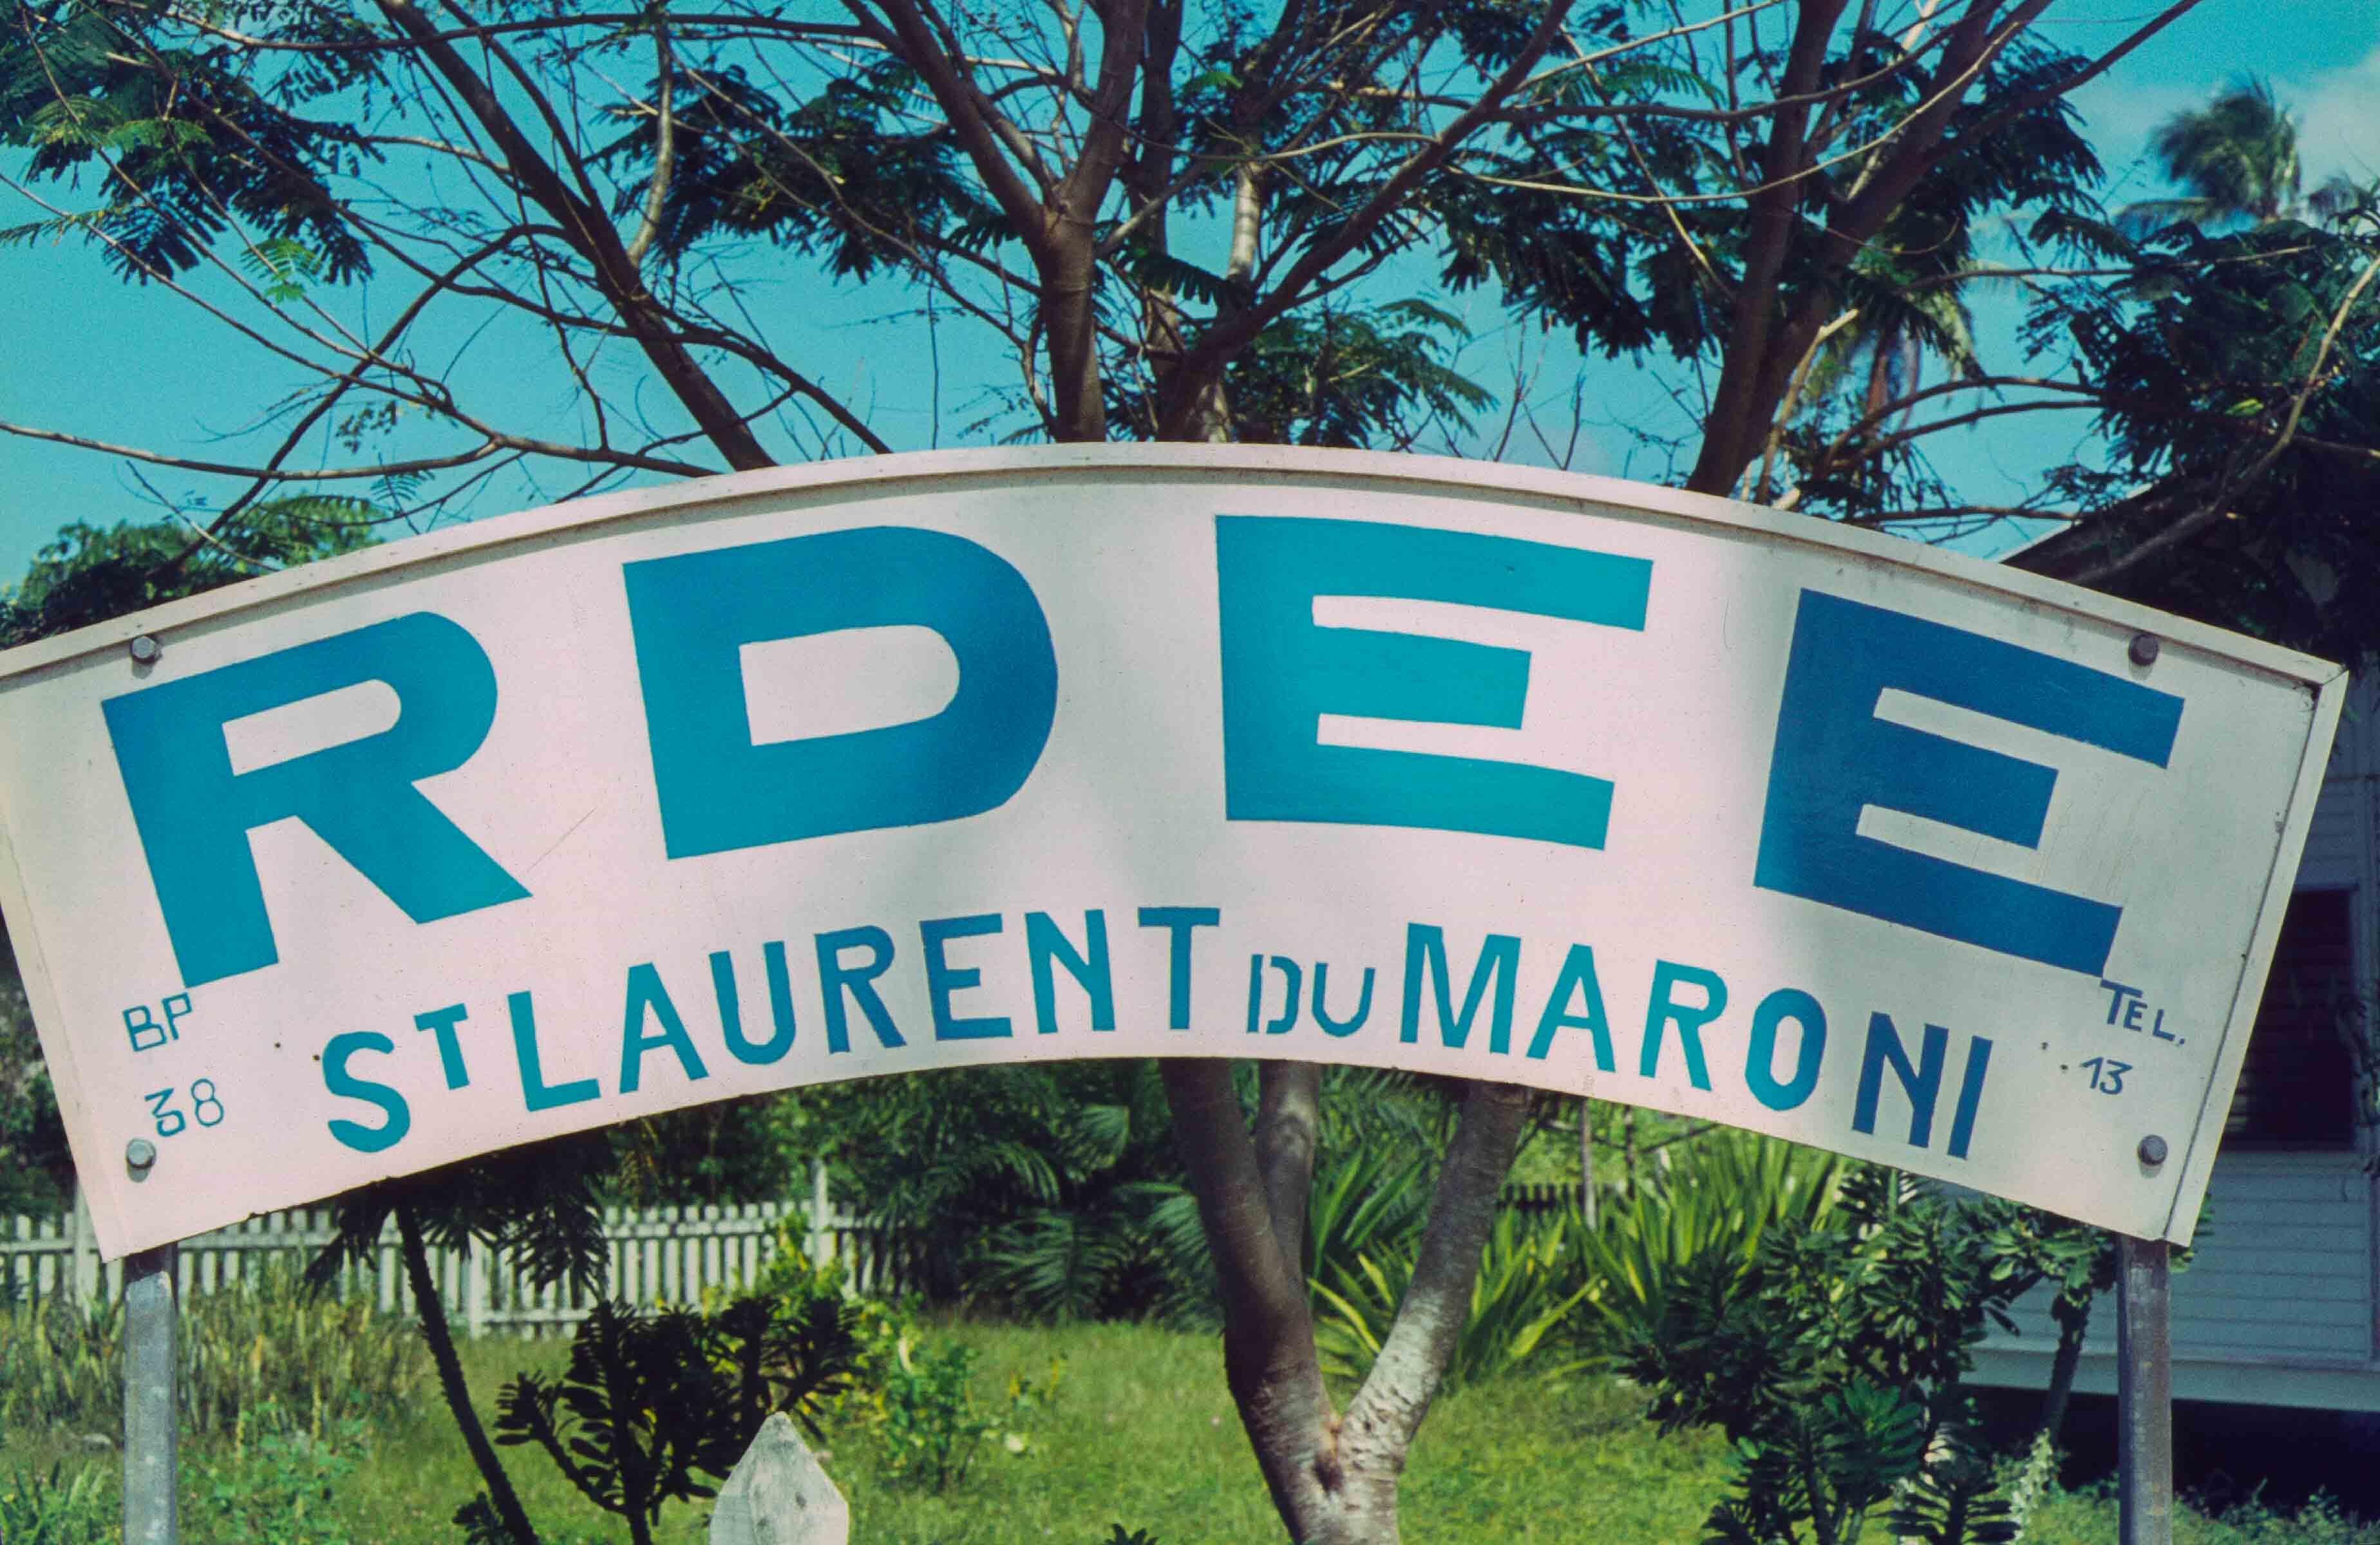 429. Suriname